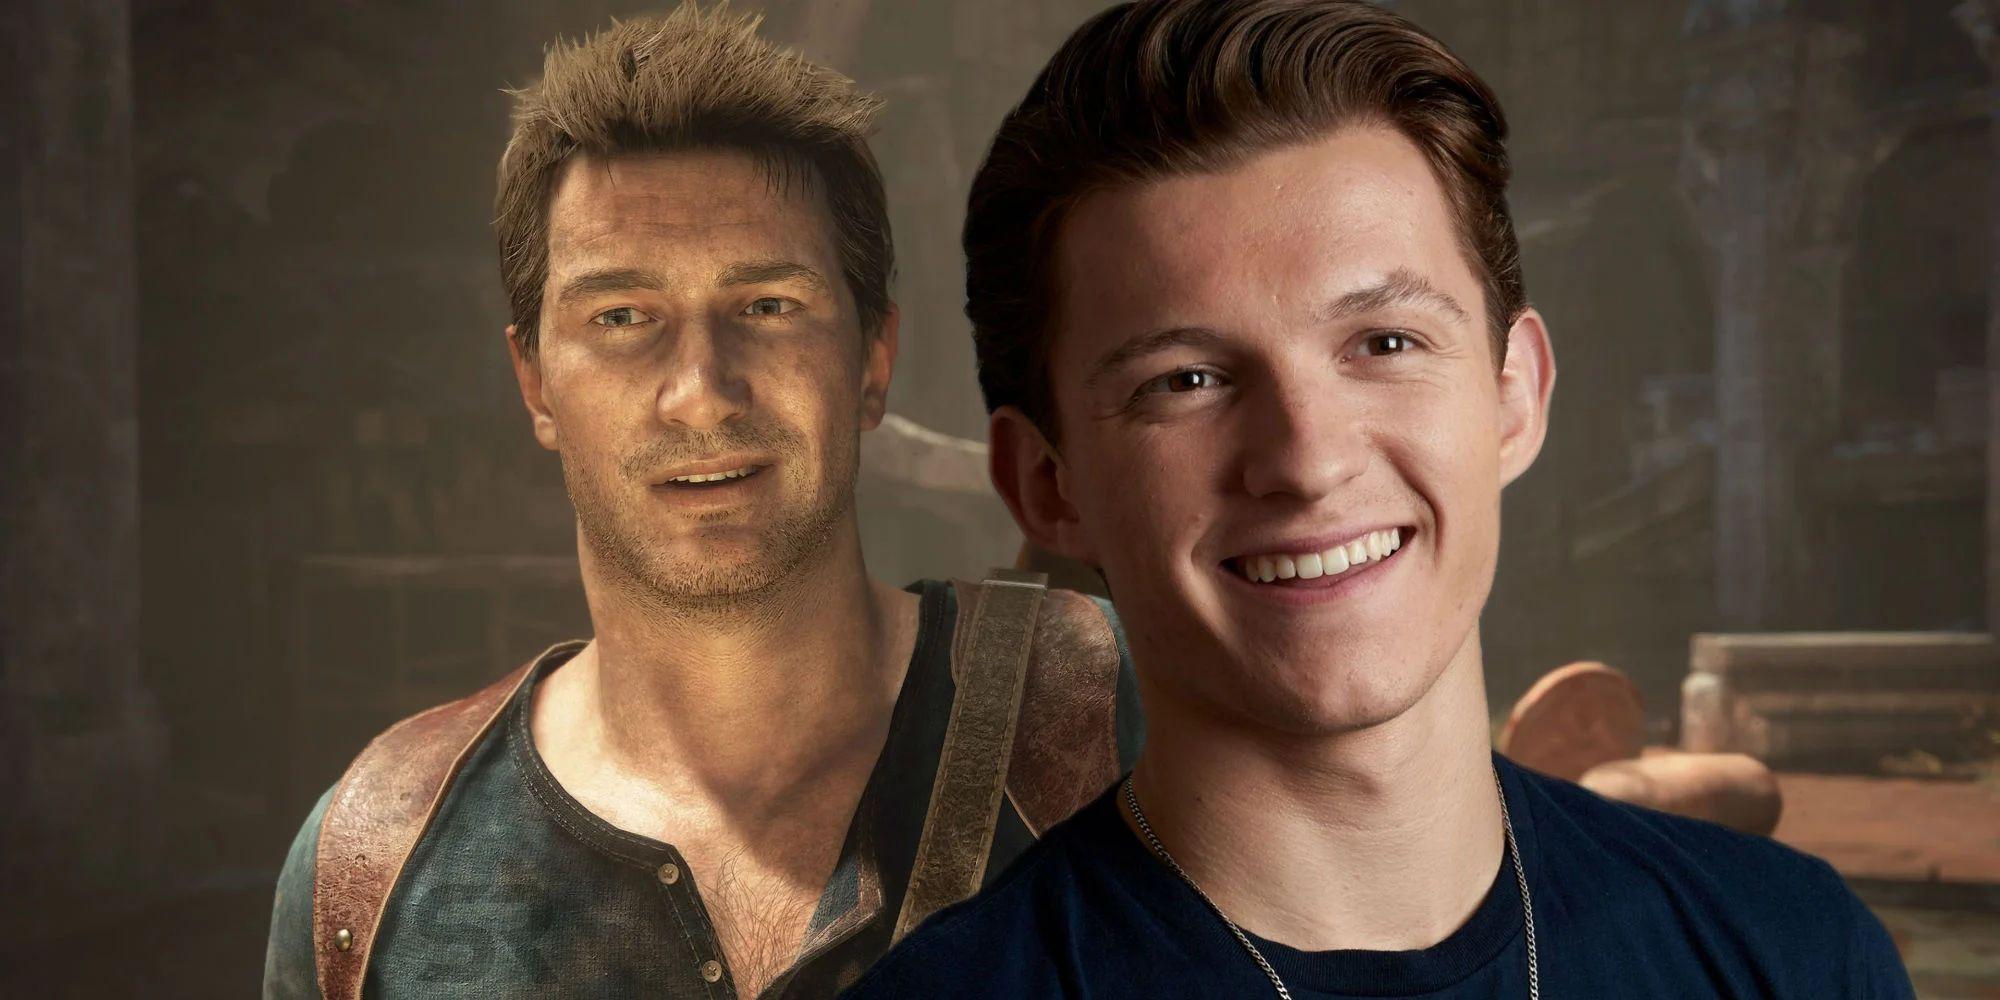 Filem Uncharted Lakonan Tom Holland Banyak Diinspirasikan Dari Uncharted 4